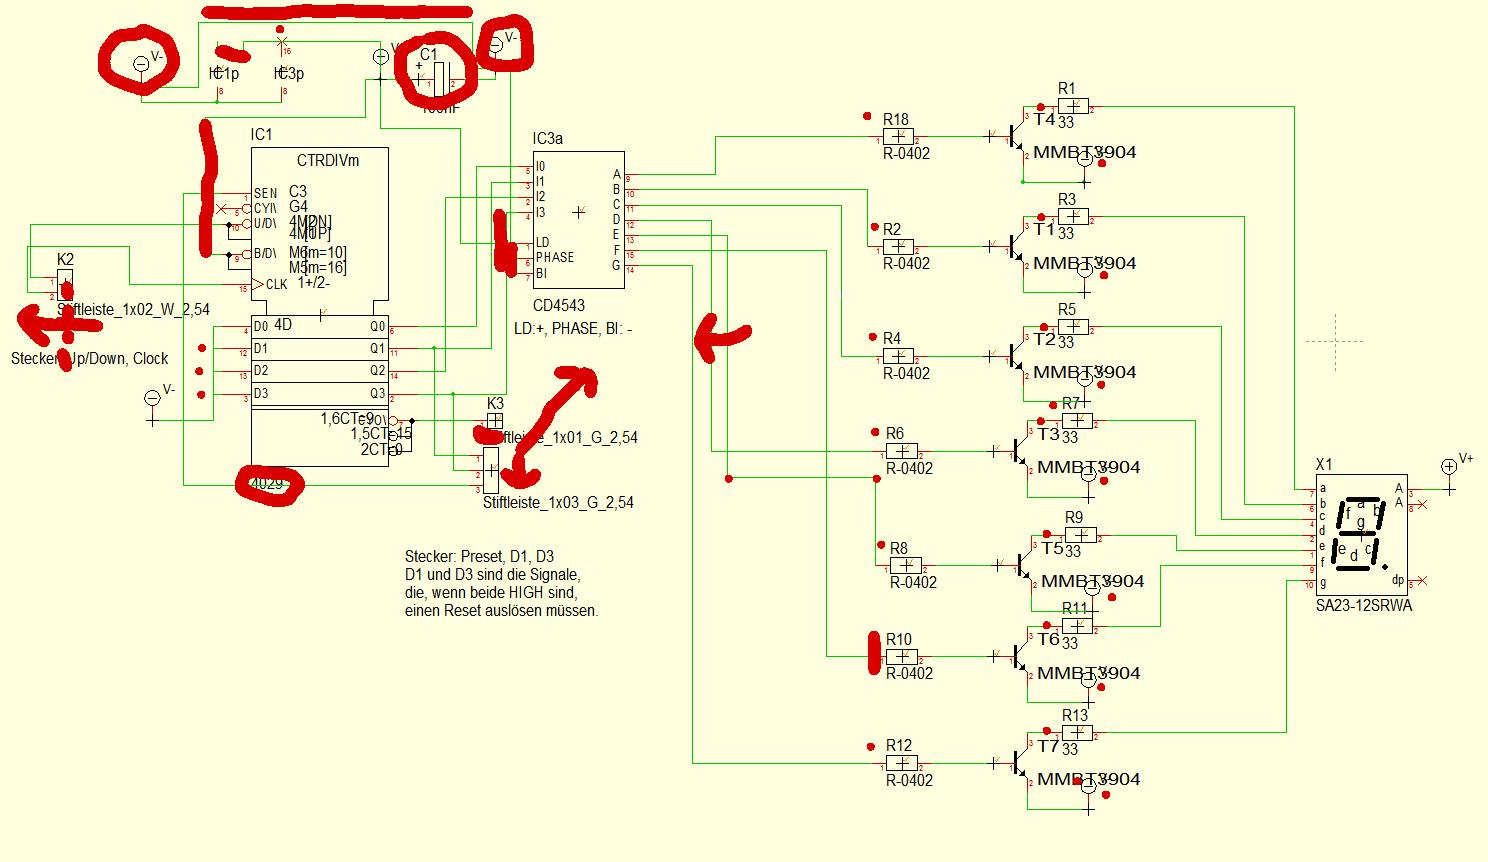 Berühmt Industrieller Elektrischer Schaltplan Ideen - Elektrische ...